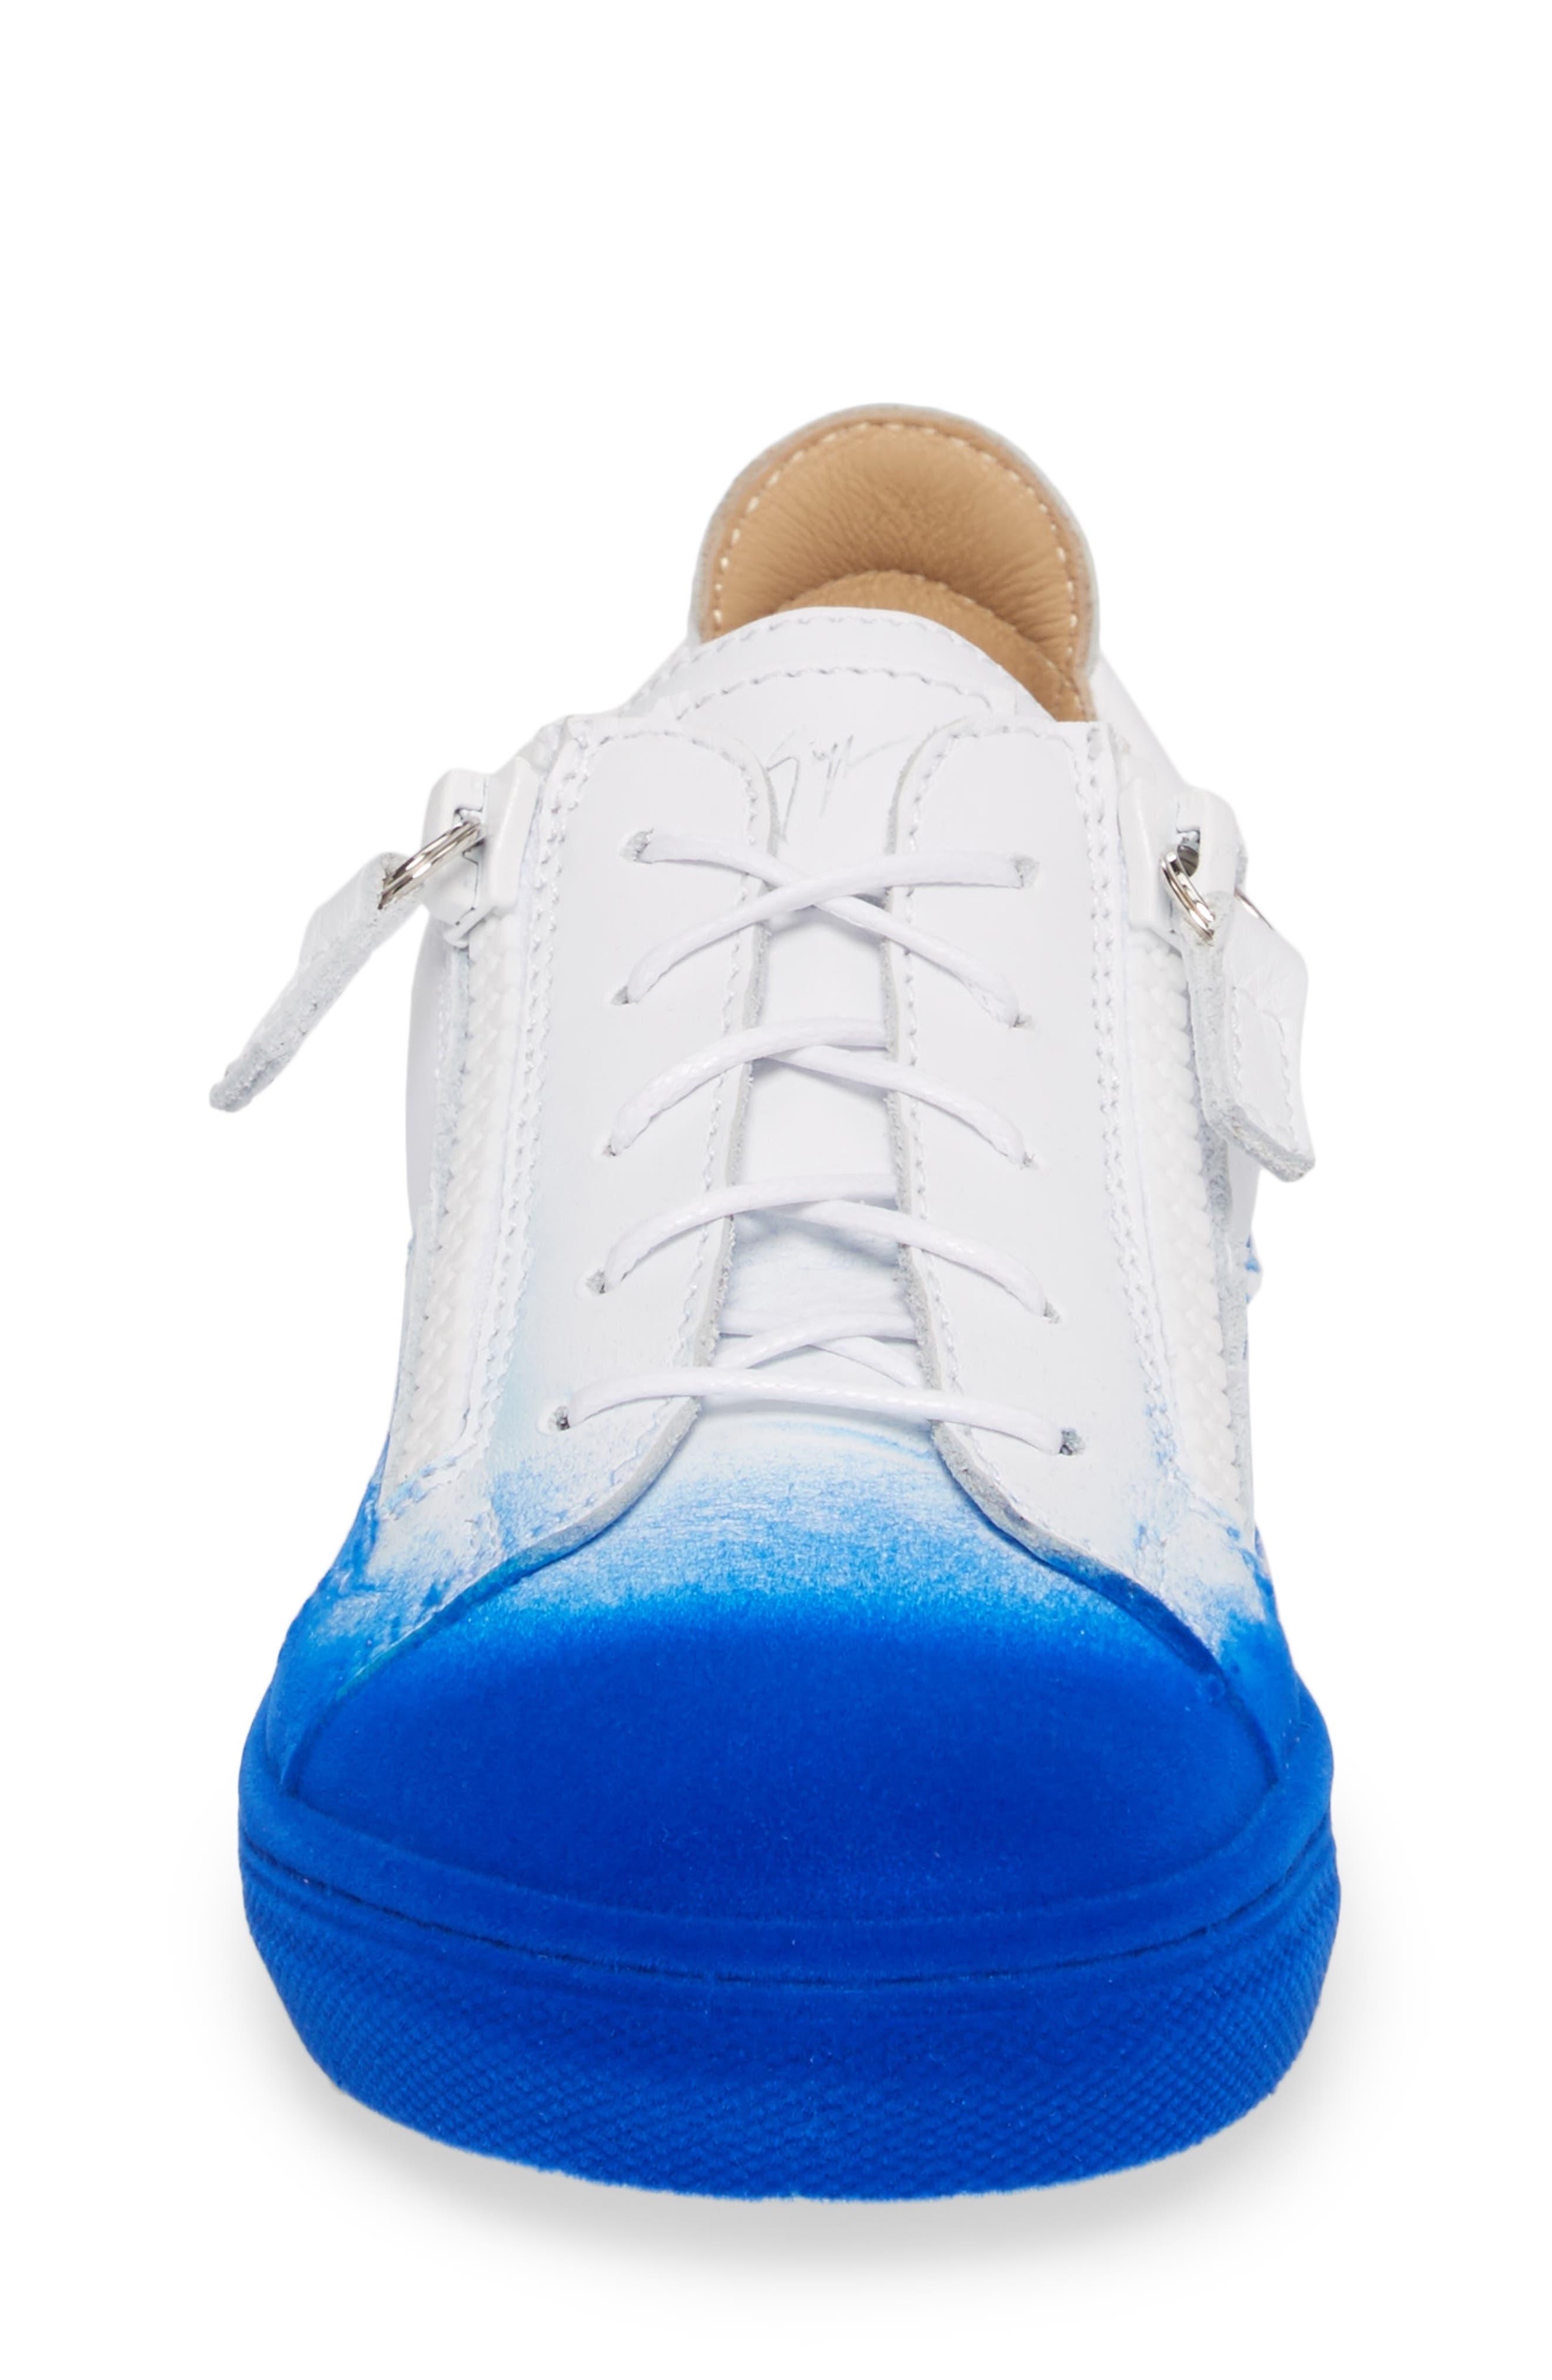 Smuggy Ombré Flocked Sneaker,                             Alternate thumbnail 4, color,                             BLUE/ WHITE